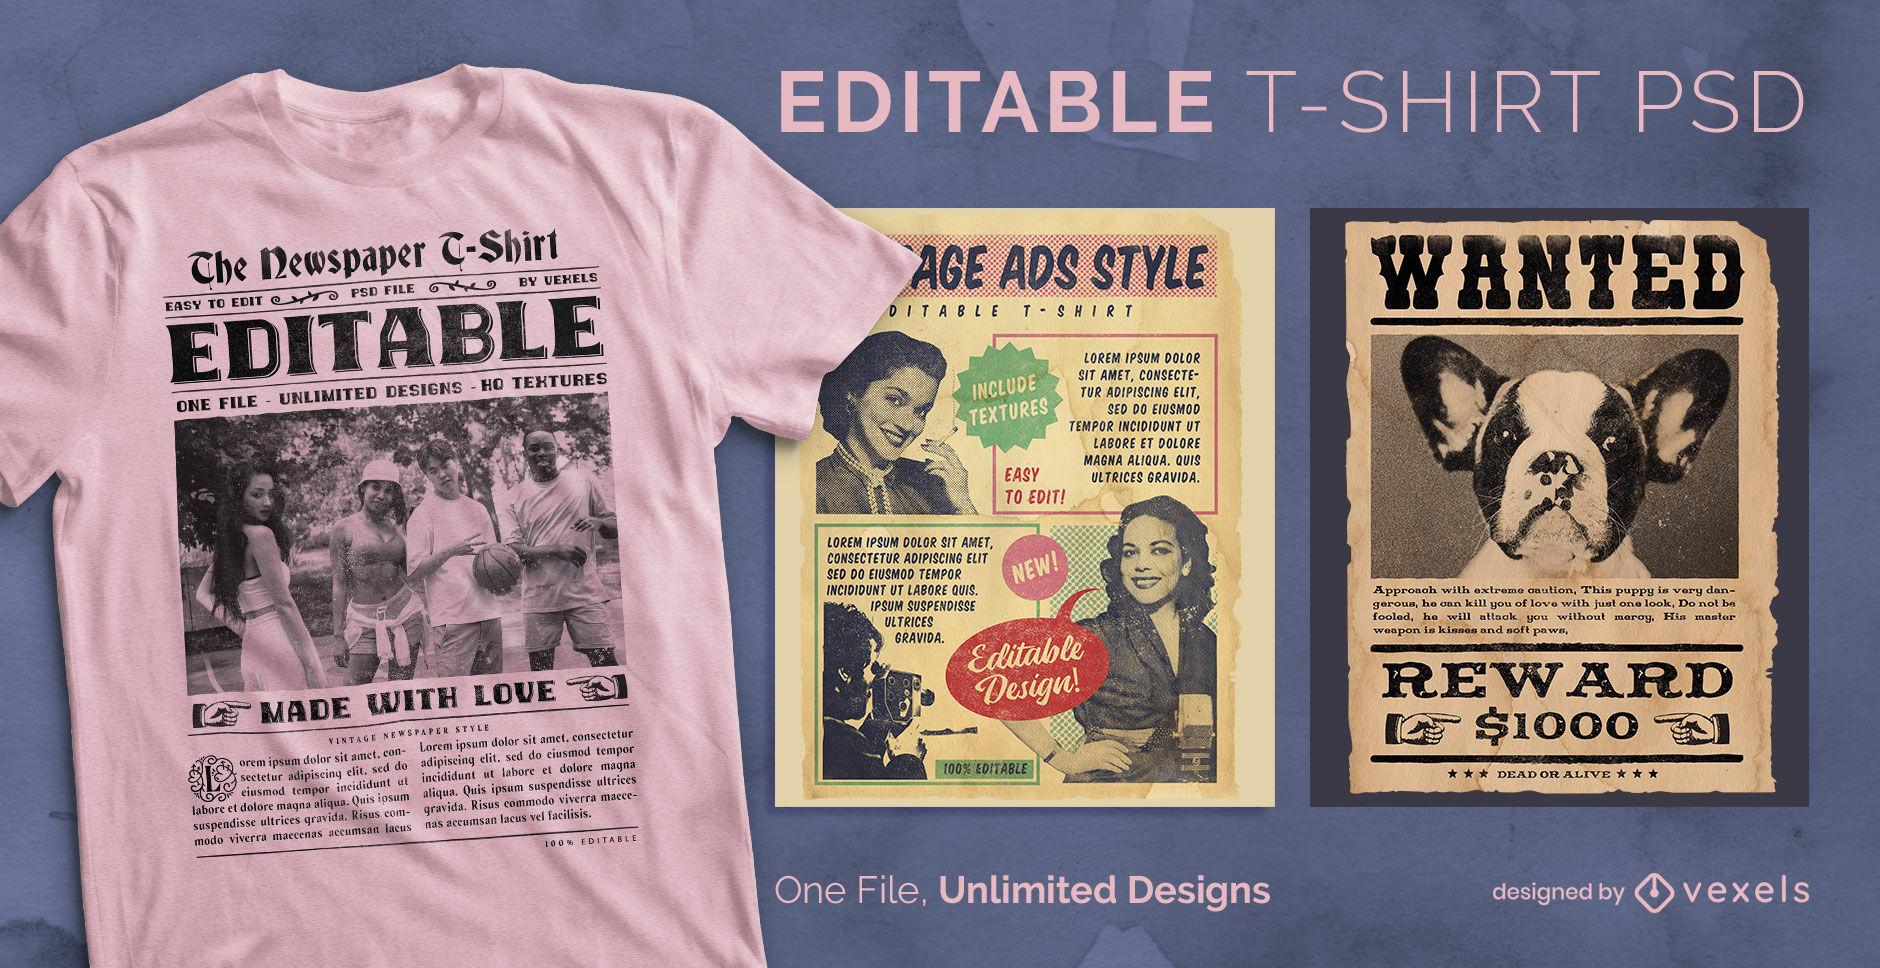 Camiseta escalable peri?dico vintage psd